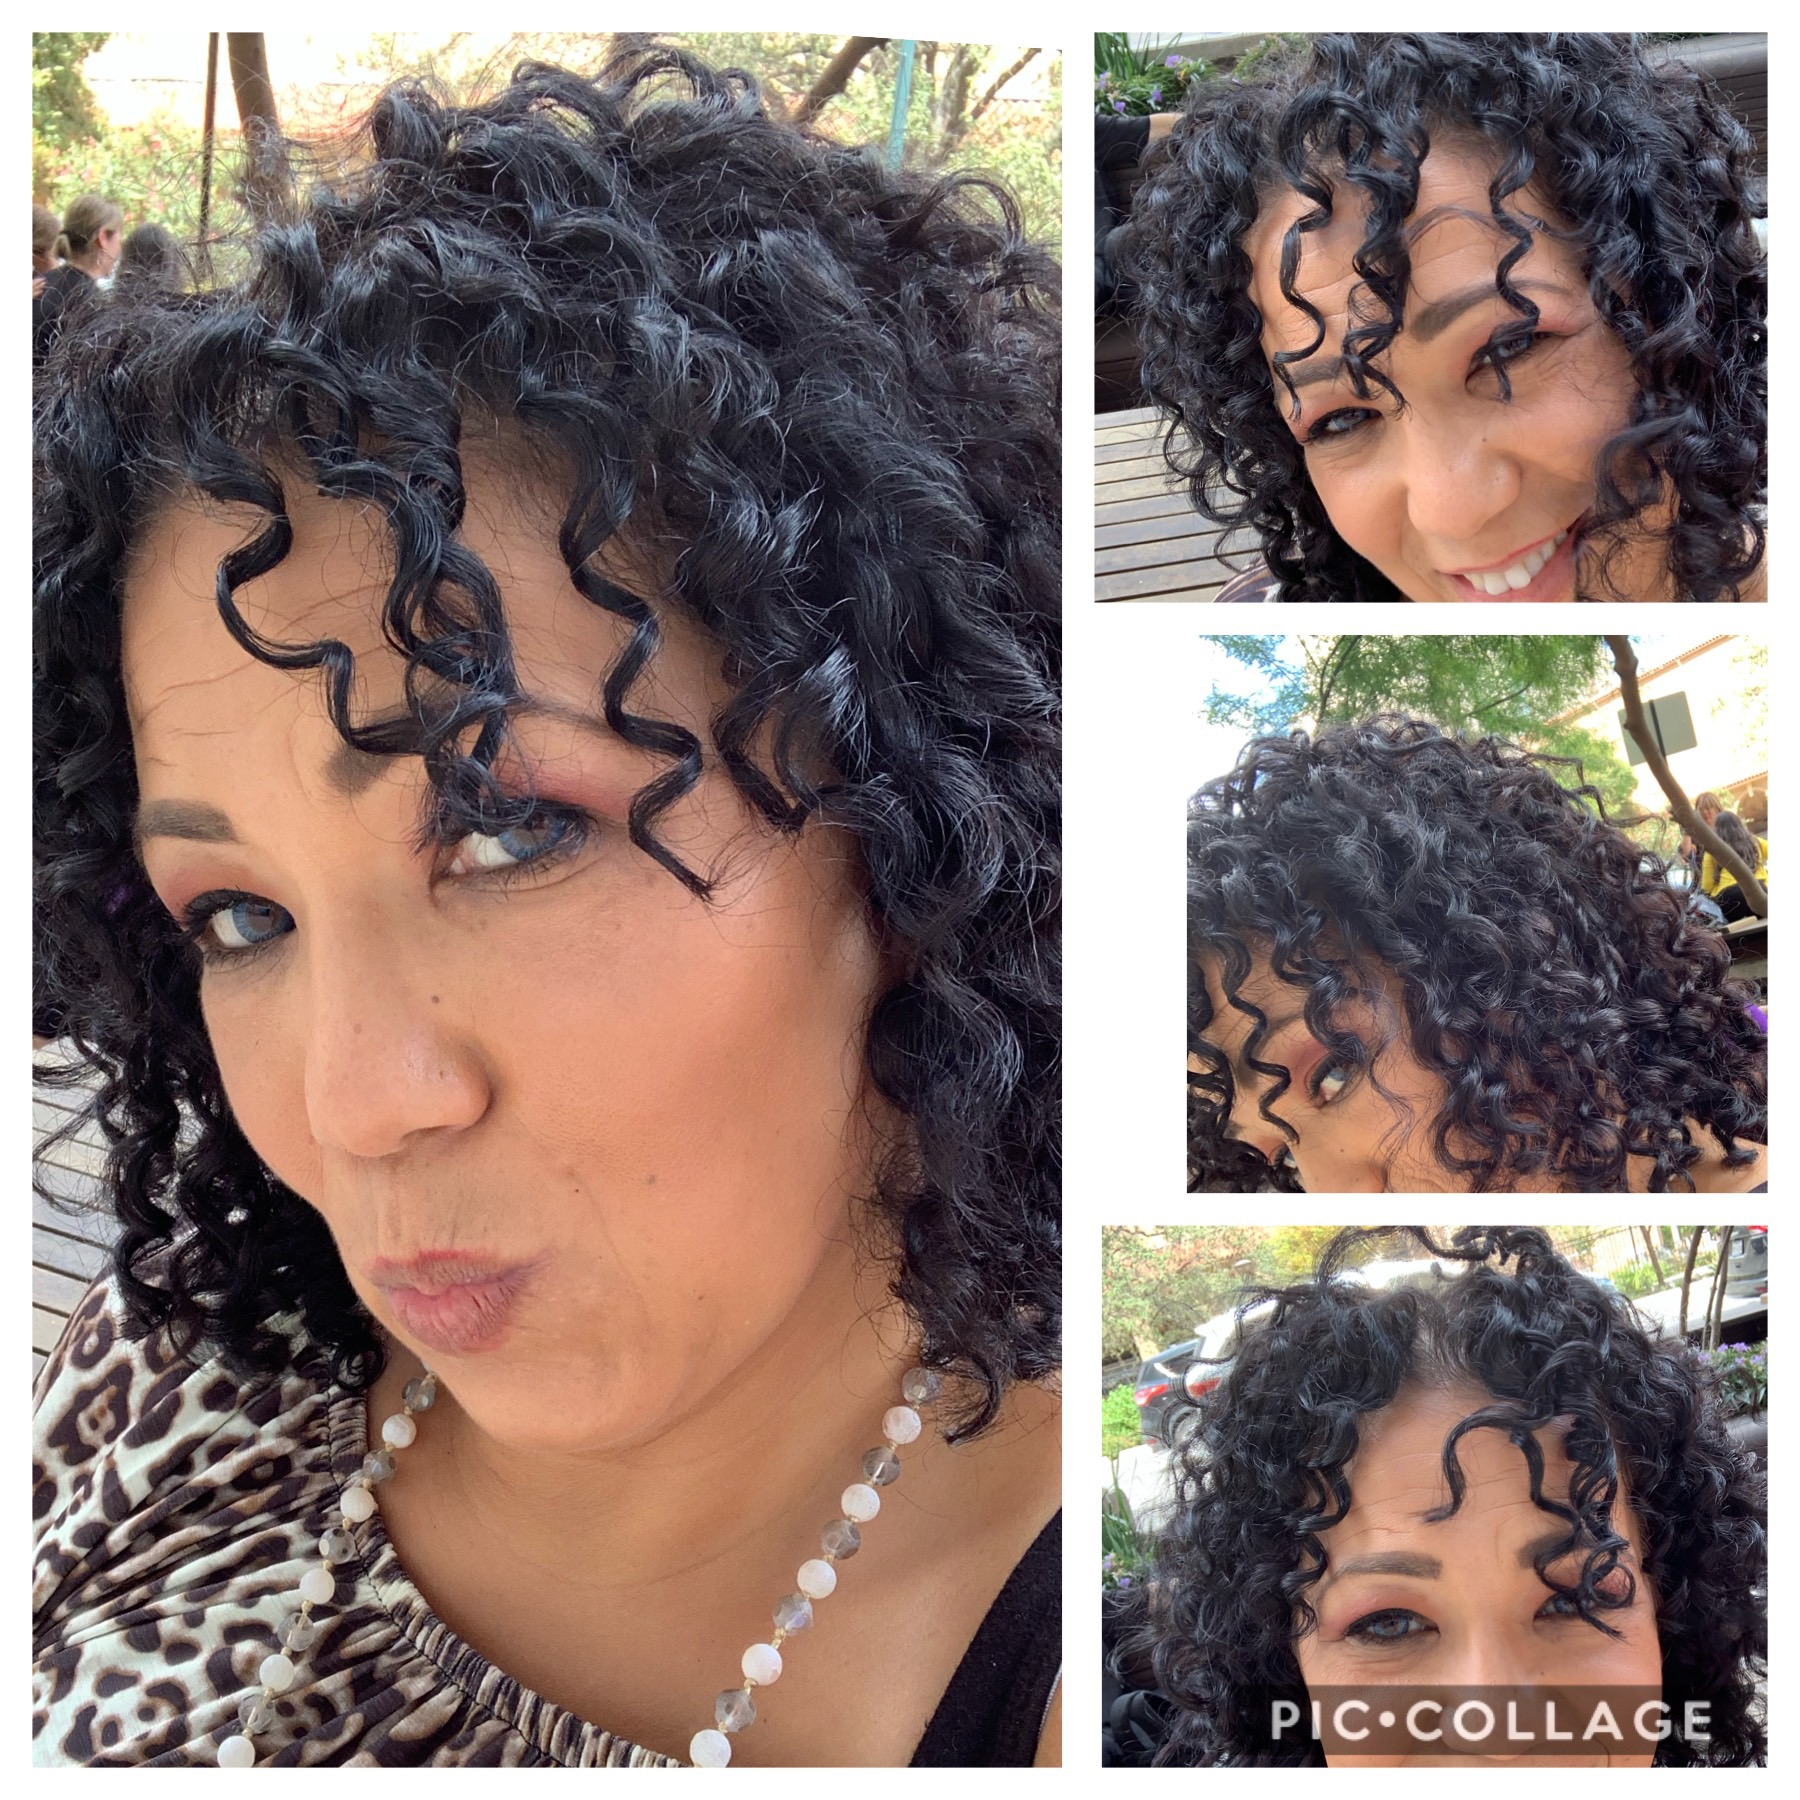 Hair Show Model